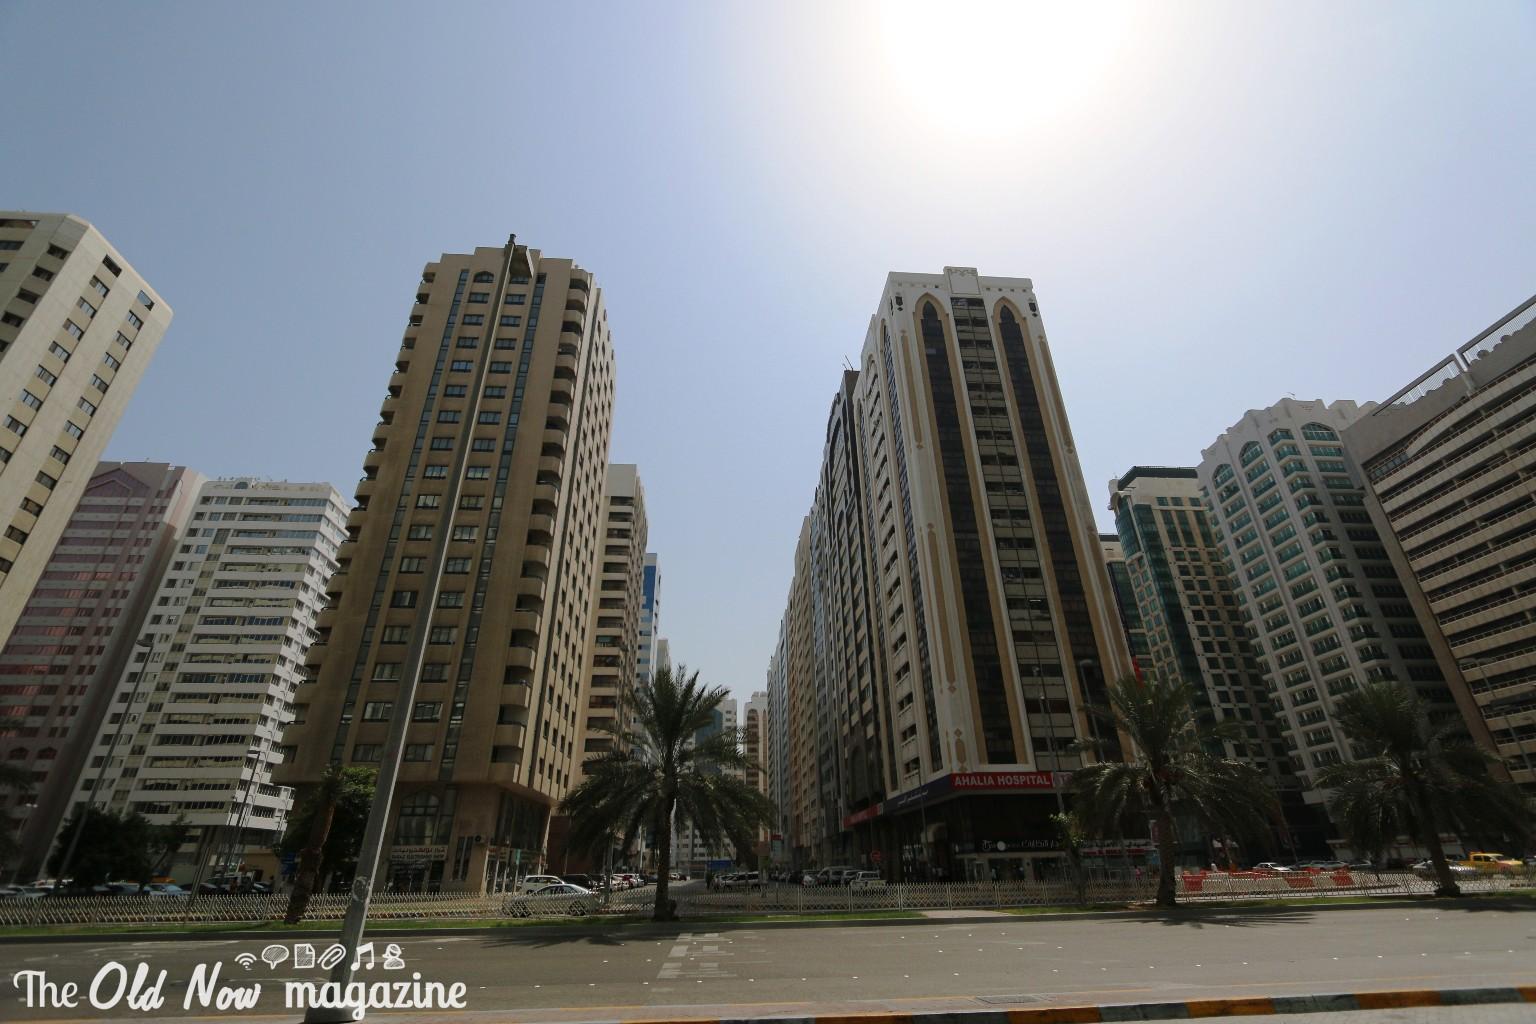 Abu Dhabi THEOLDNOW DAY 1 (13)